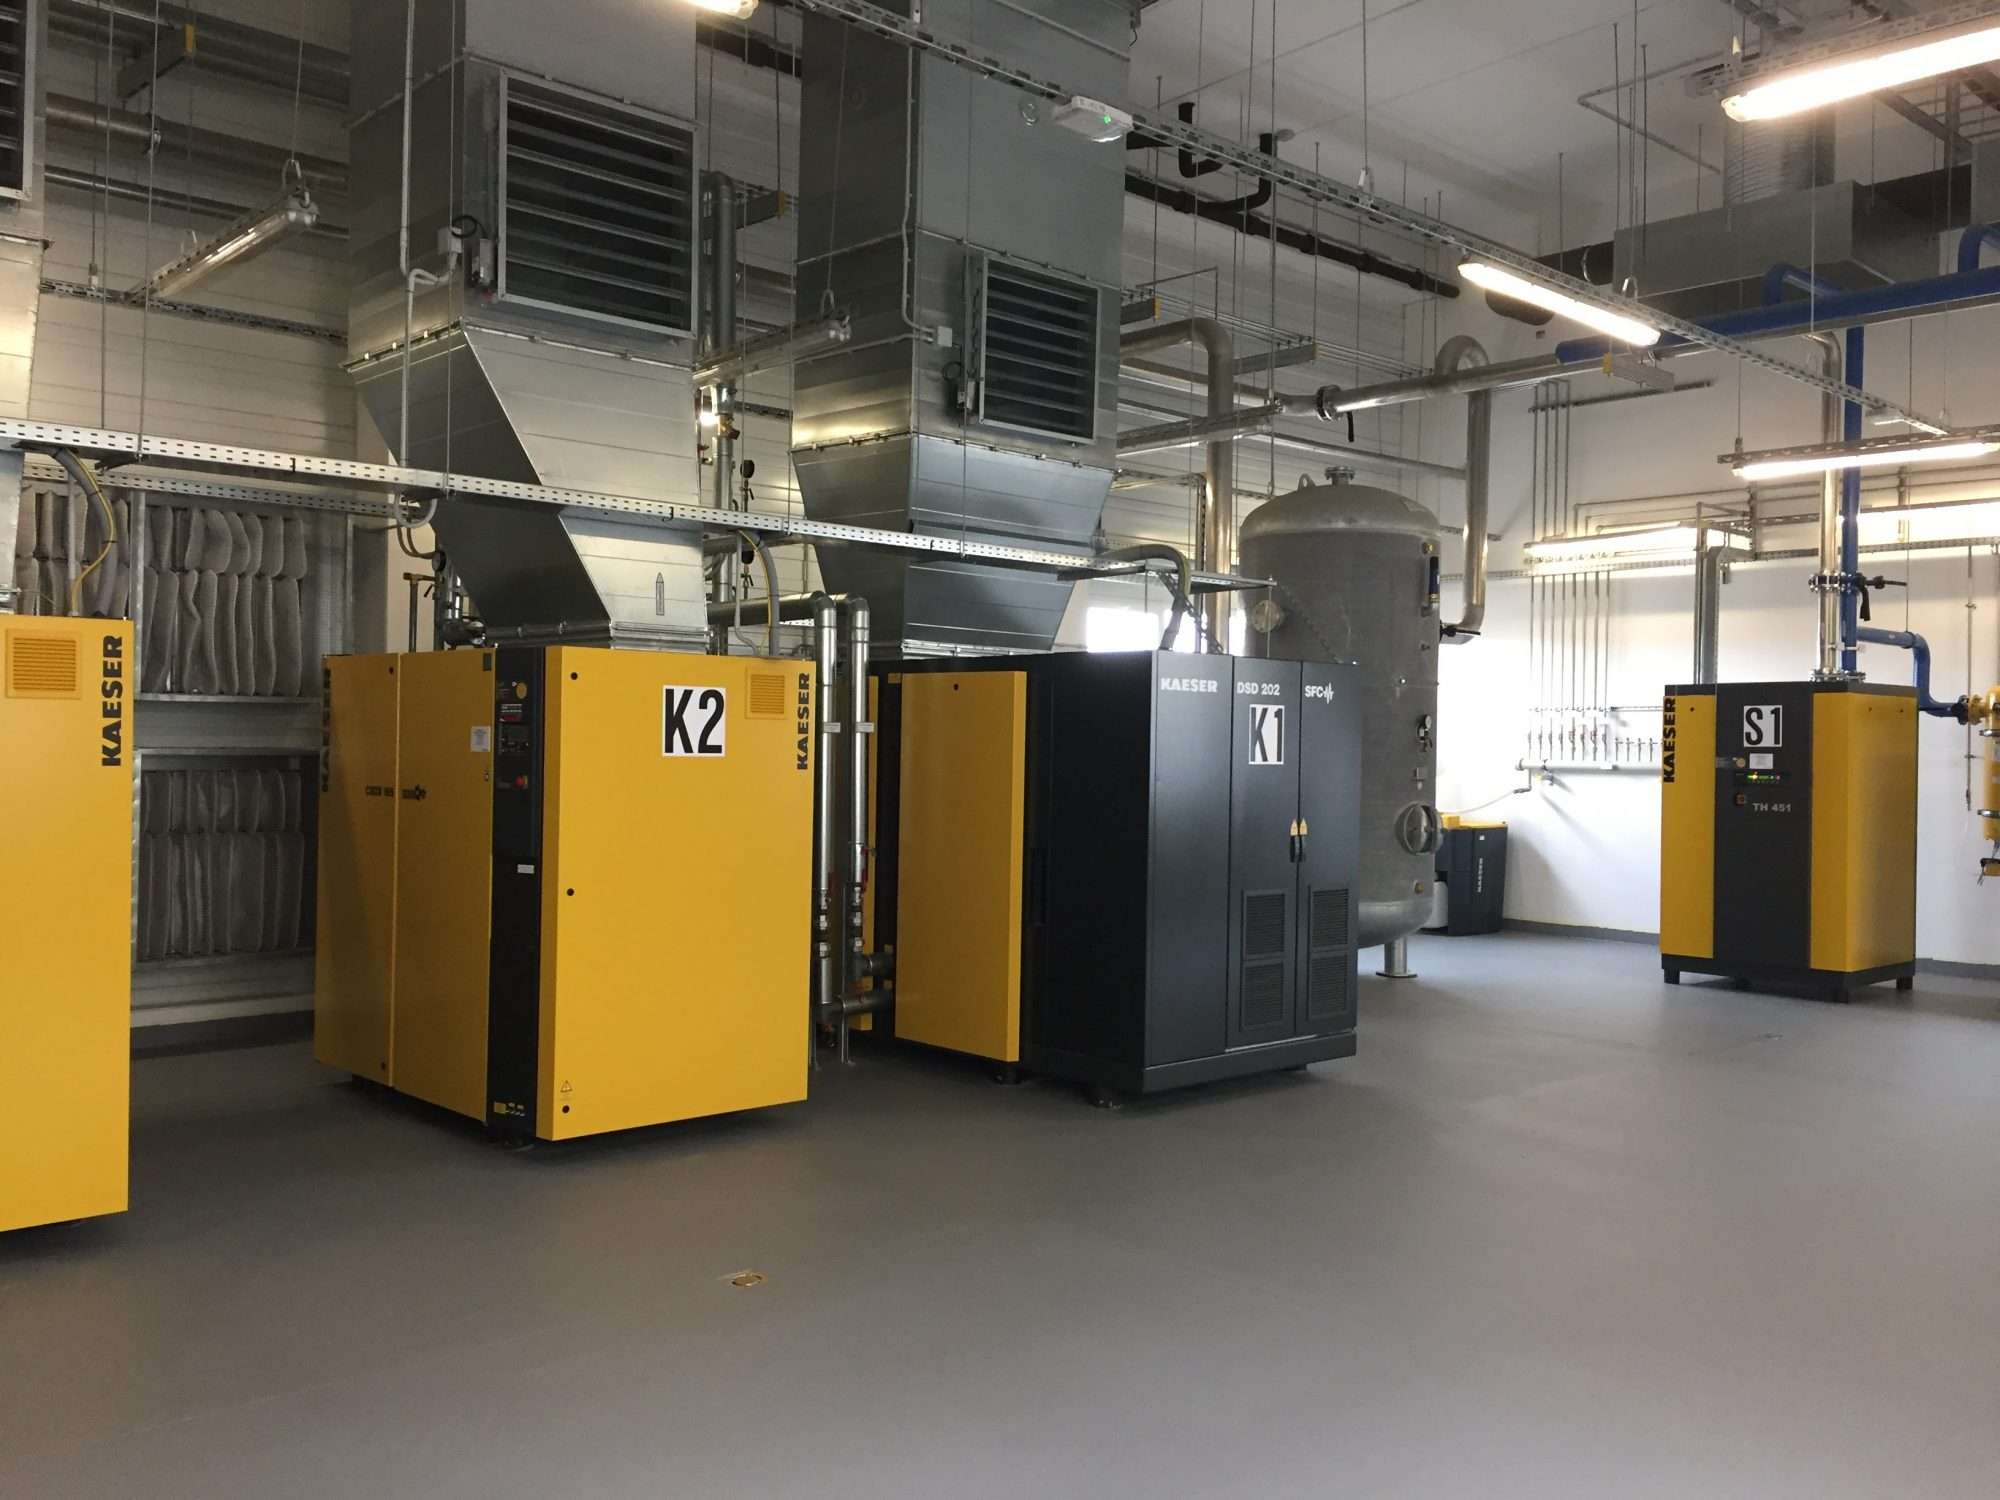 Compressor plants